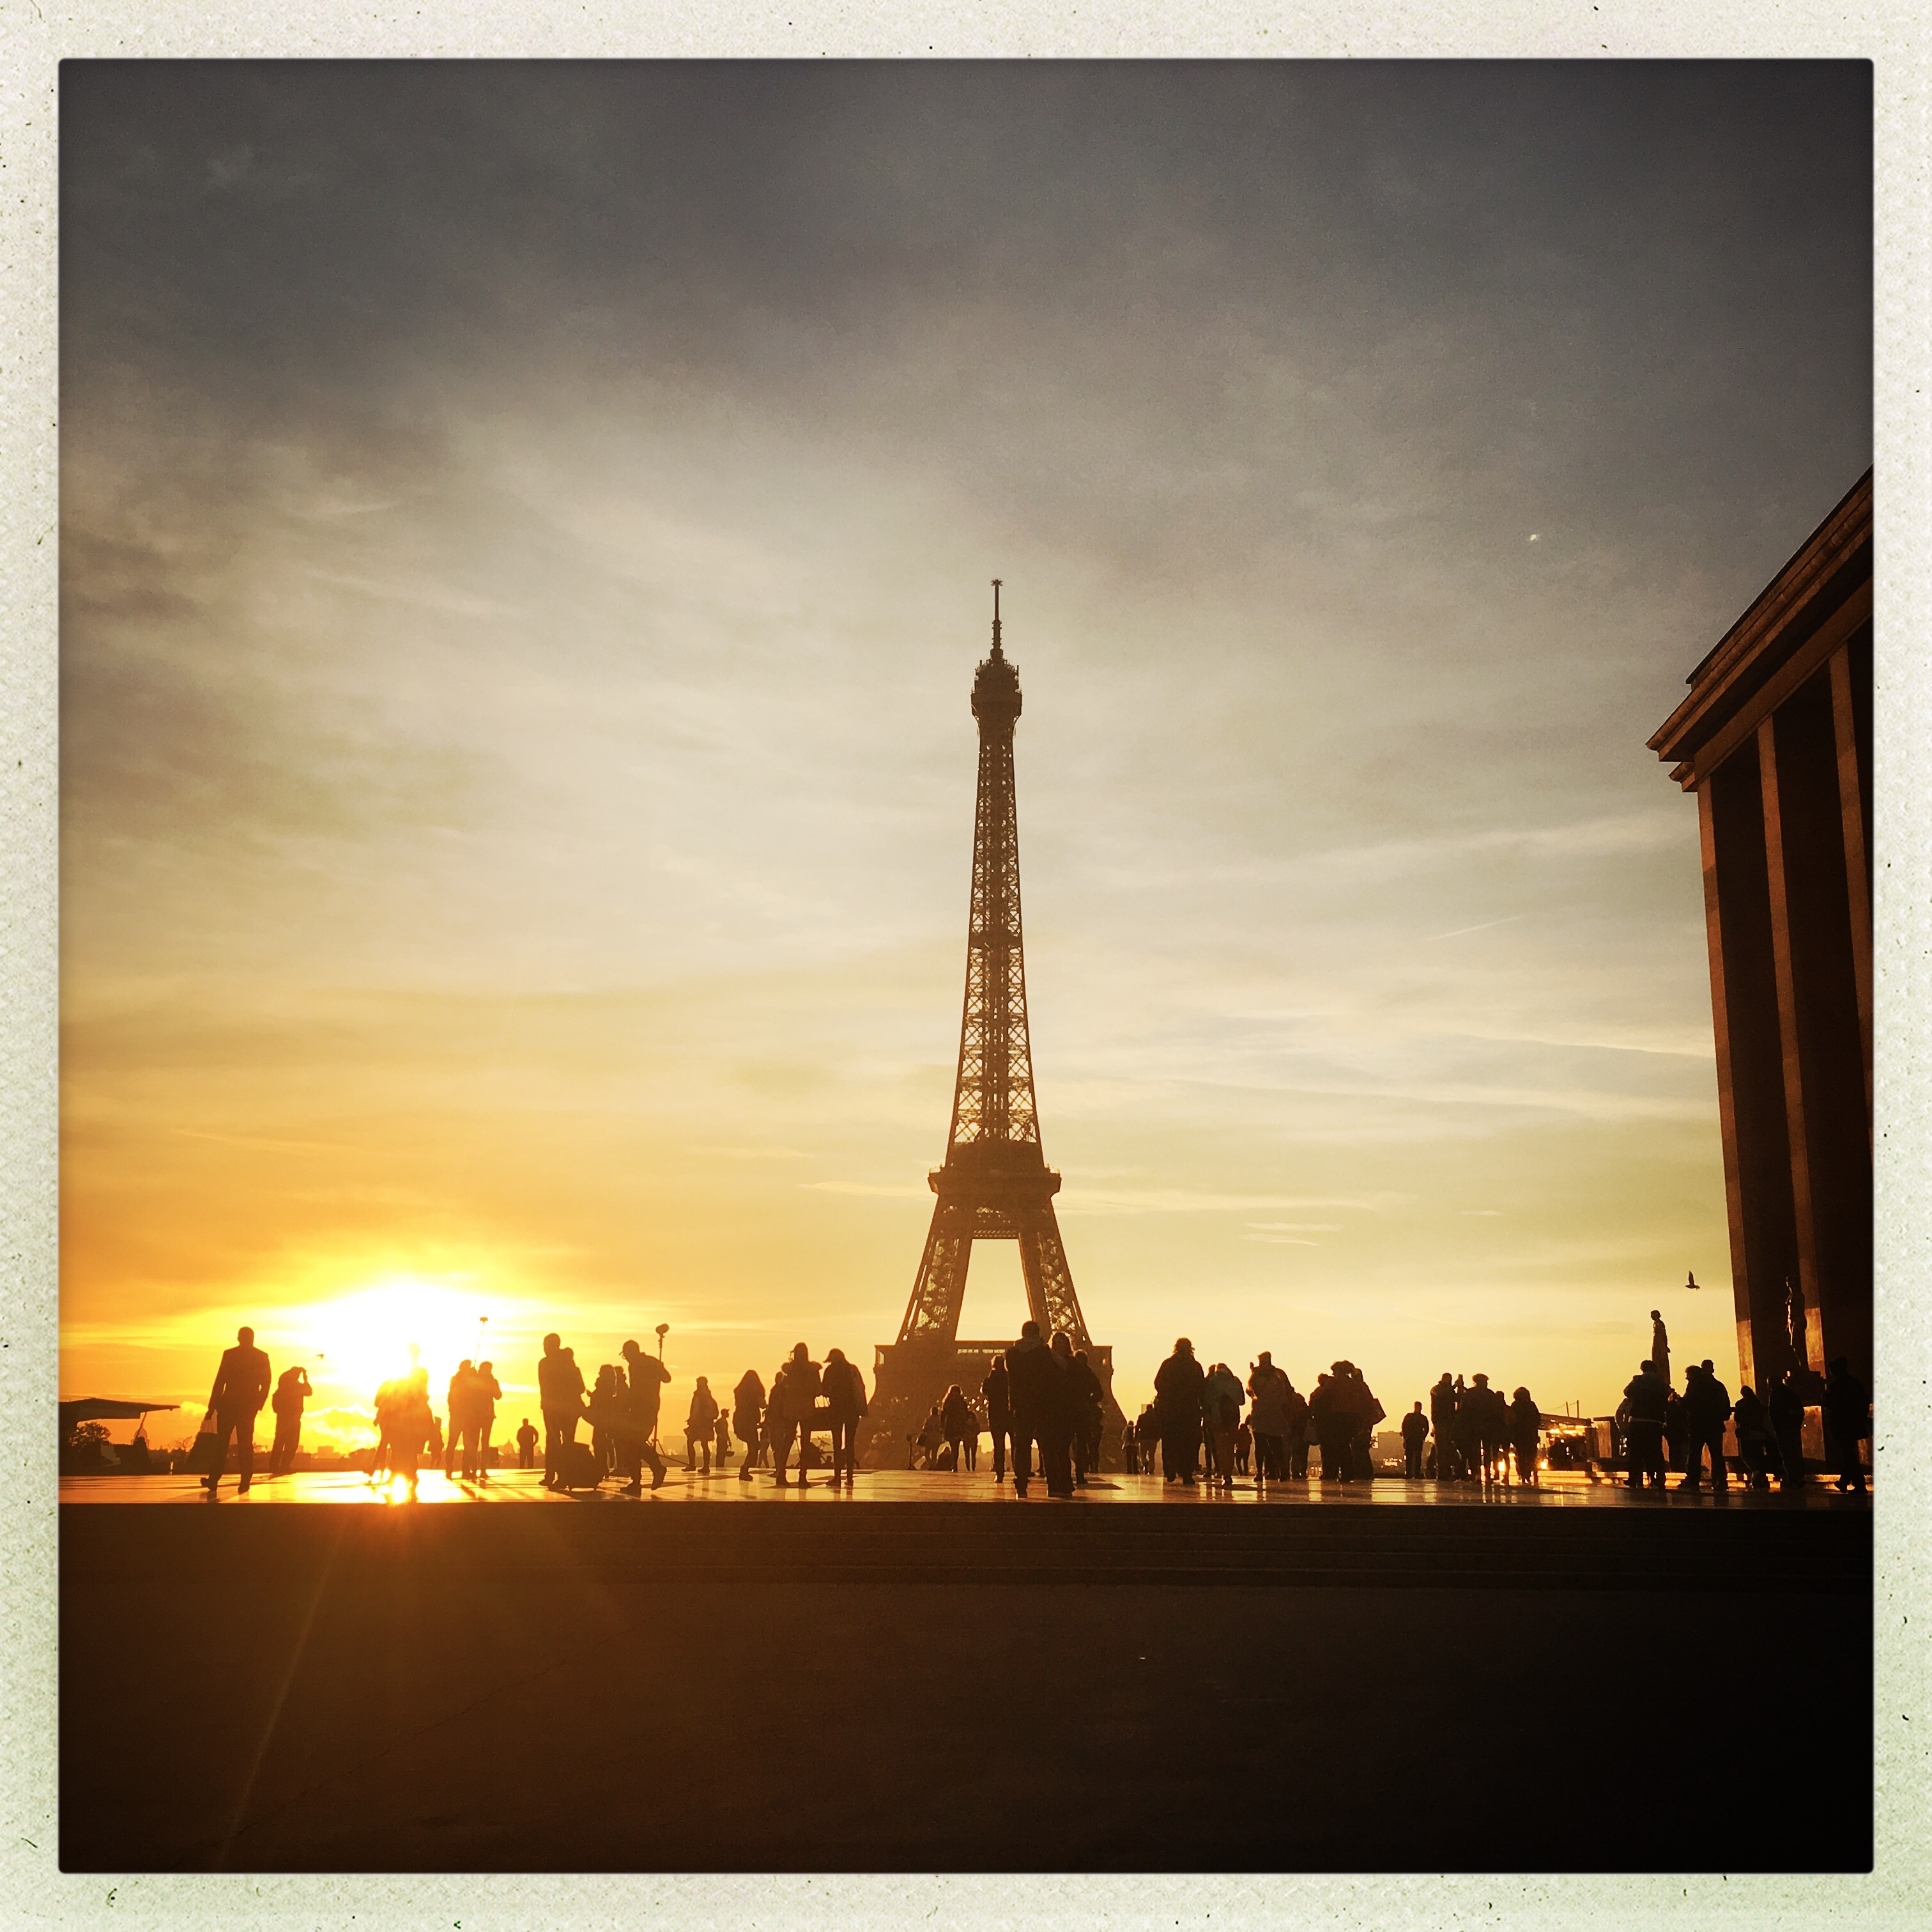 Paris, Trocadéro, Tour Eiffel, I lov